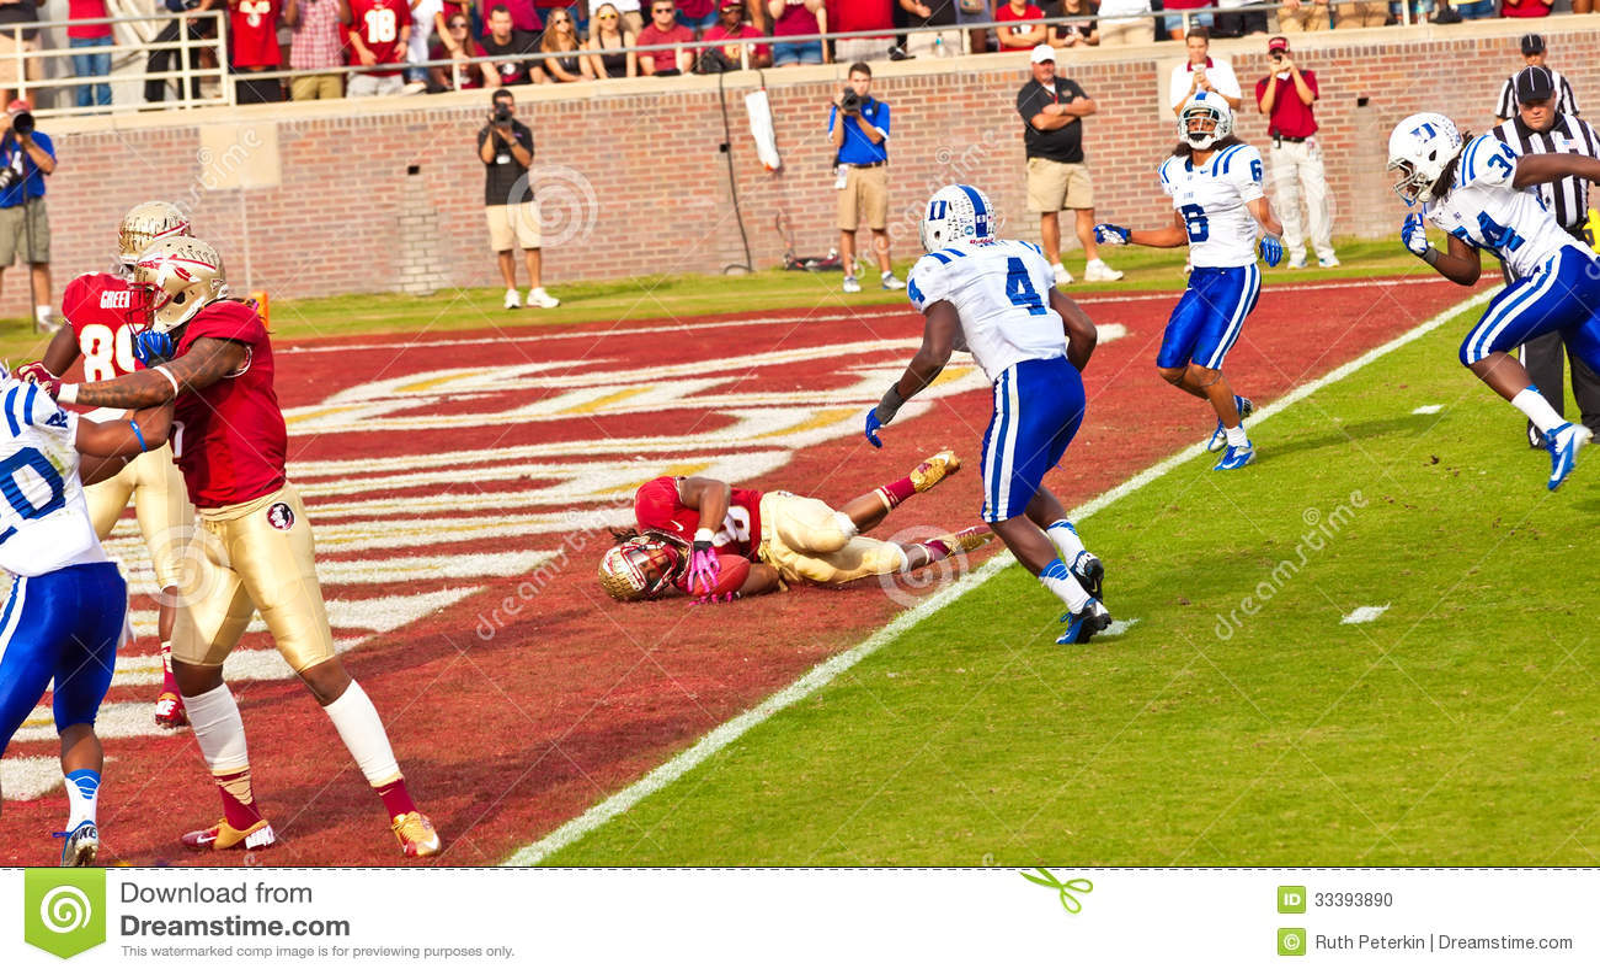 college football game length florida ncaaf